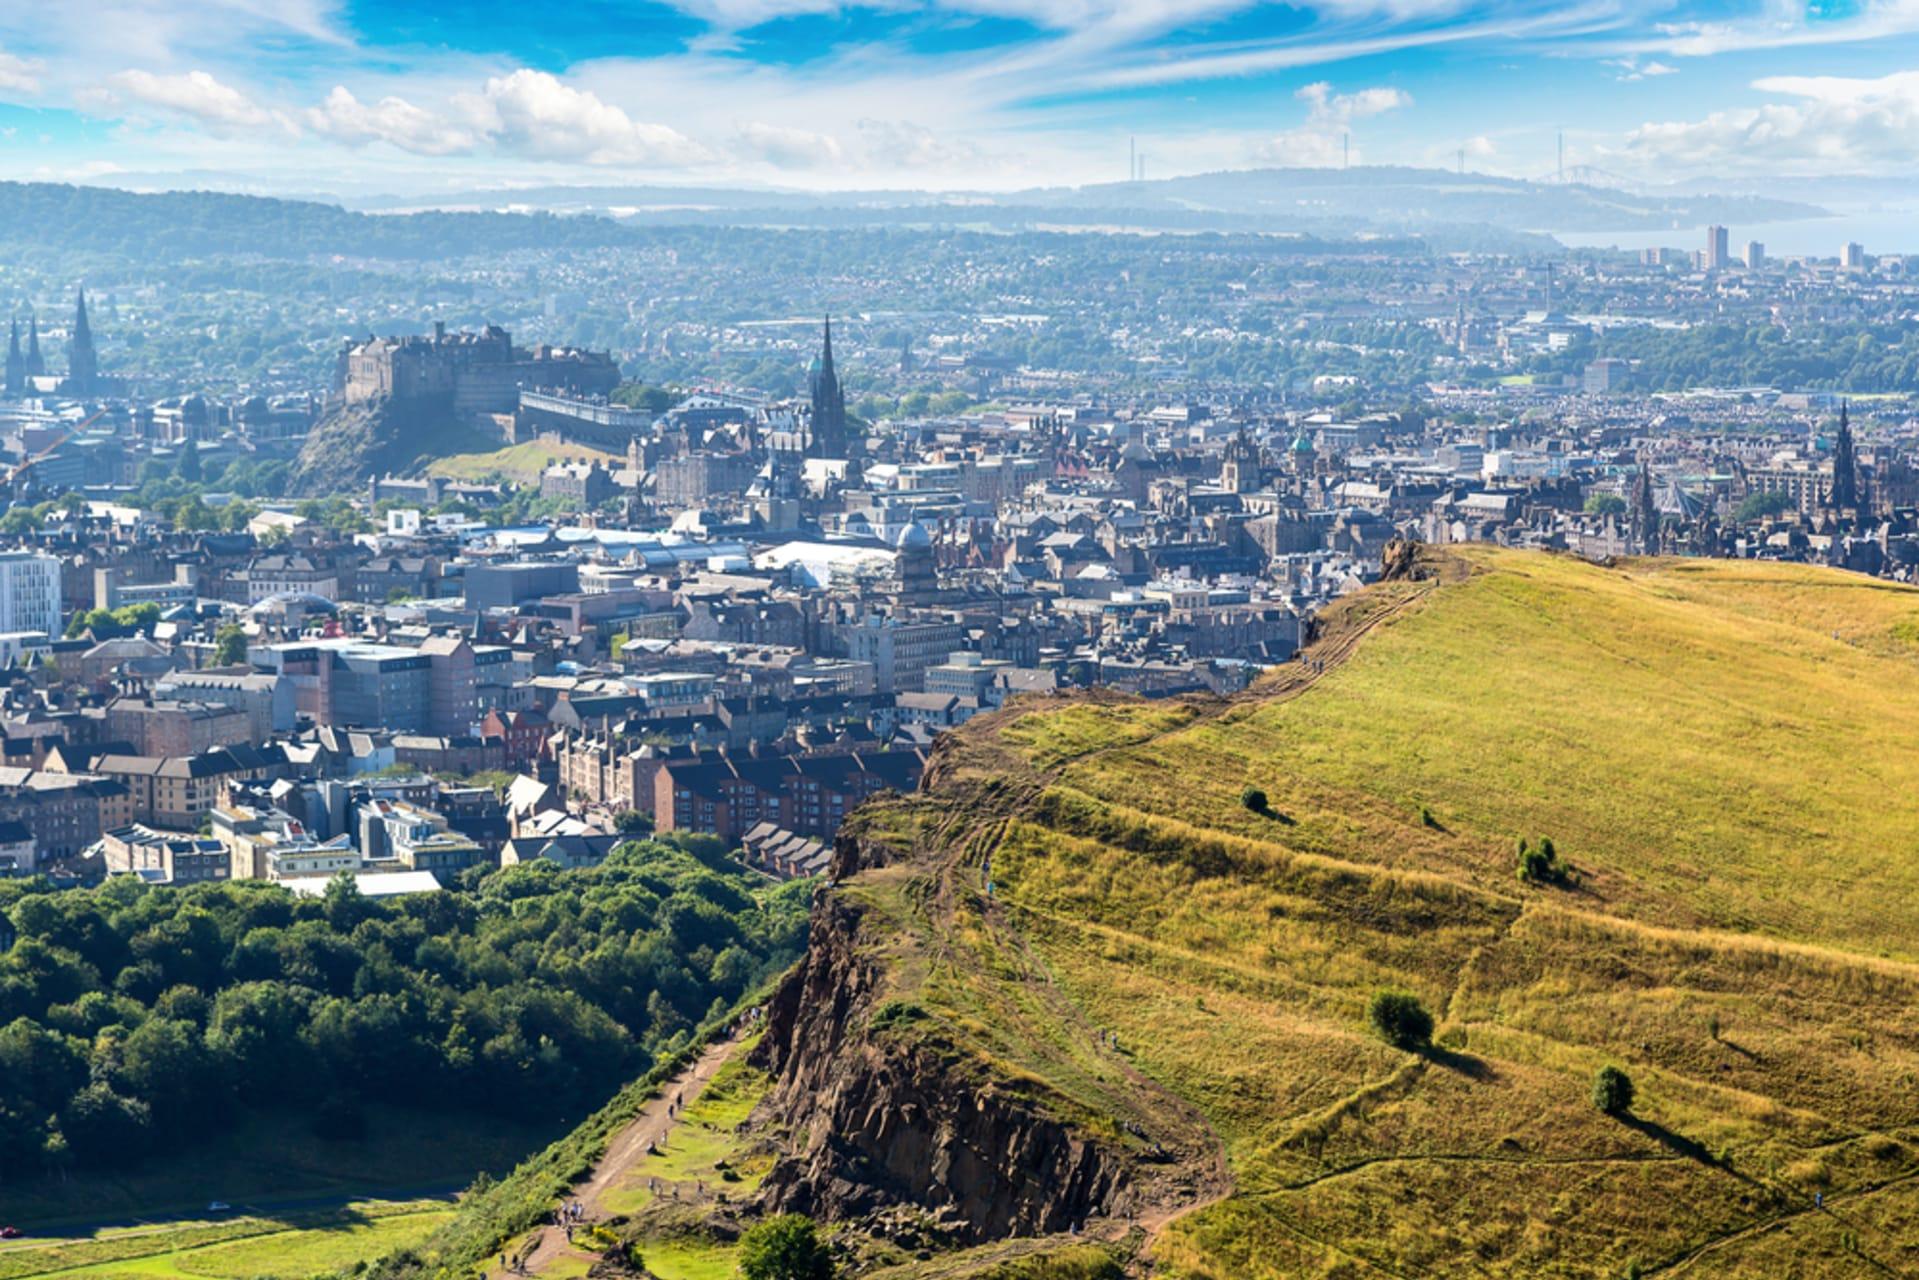 Edinburgh - Arthur's Seat - views from an ancient volcano!